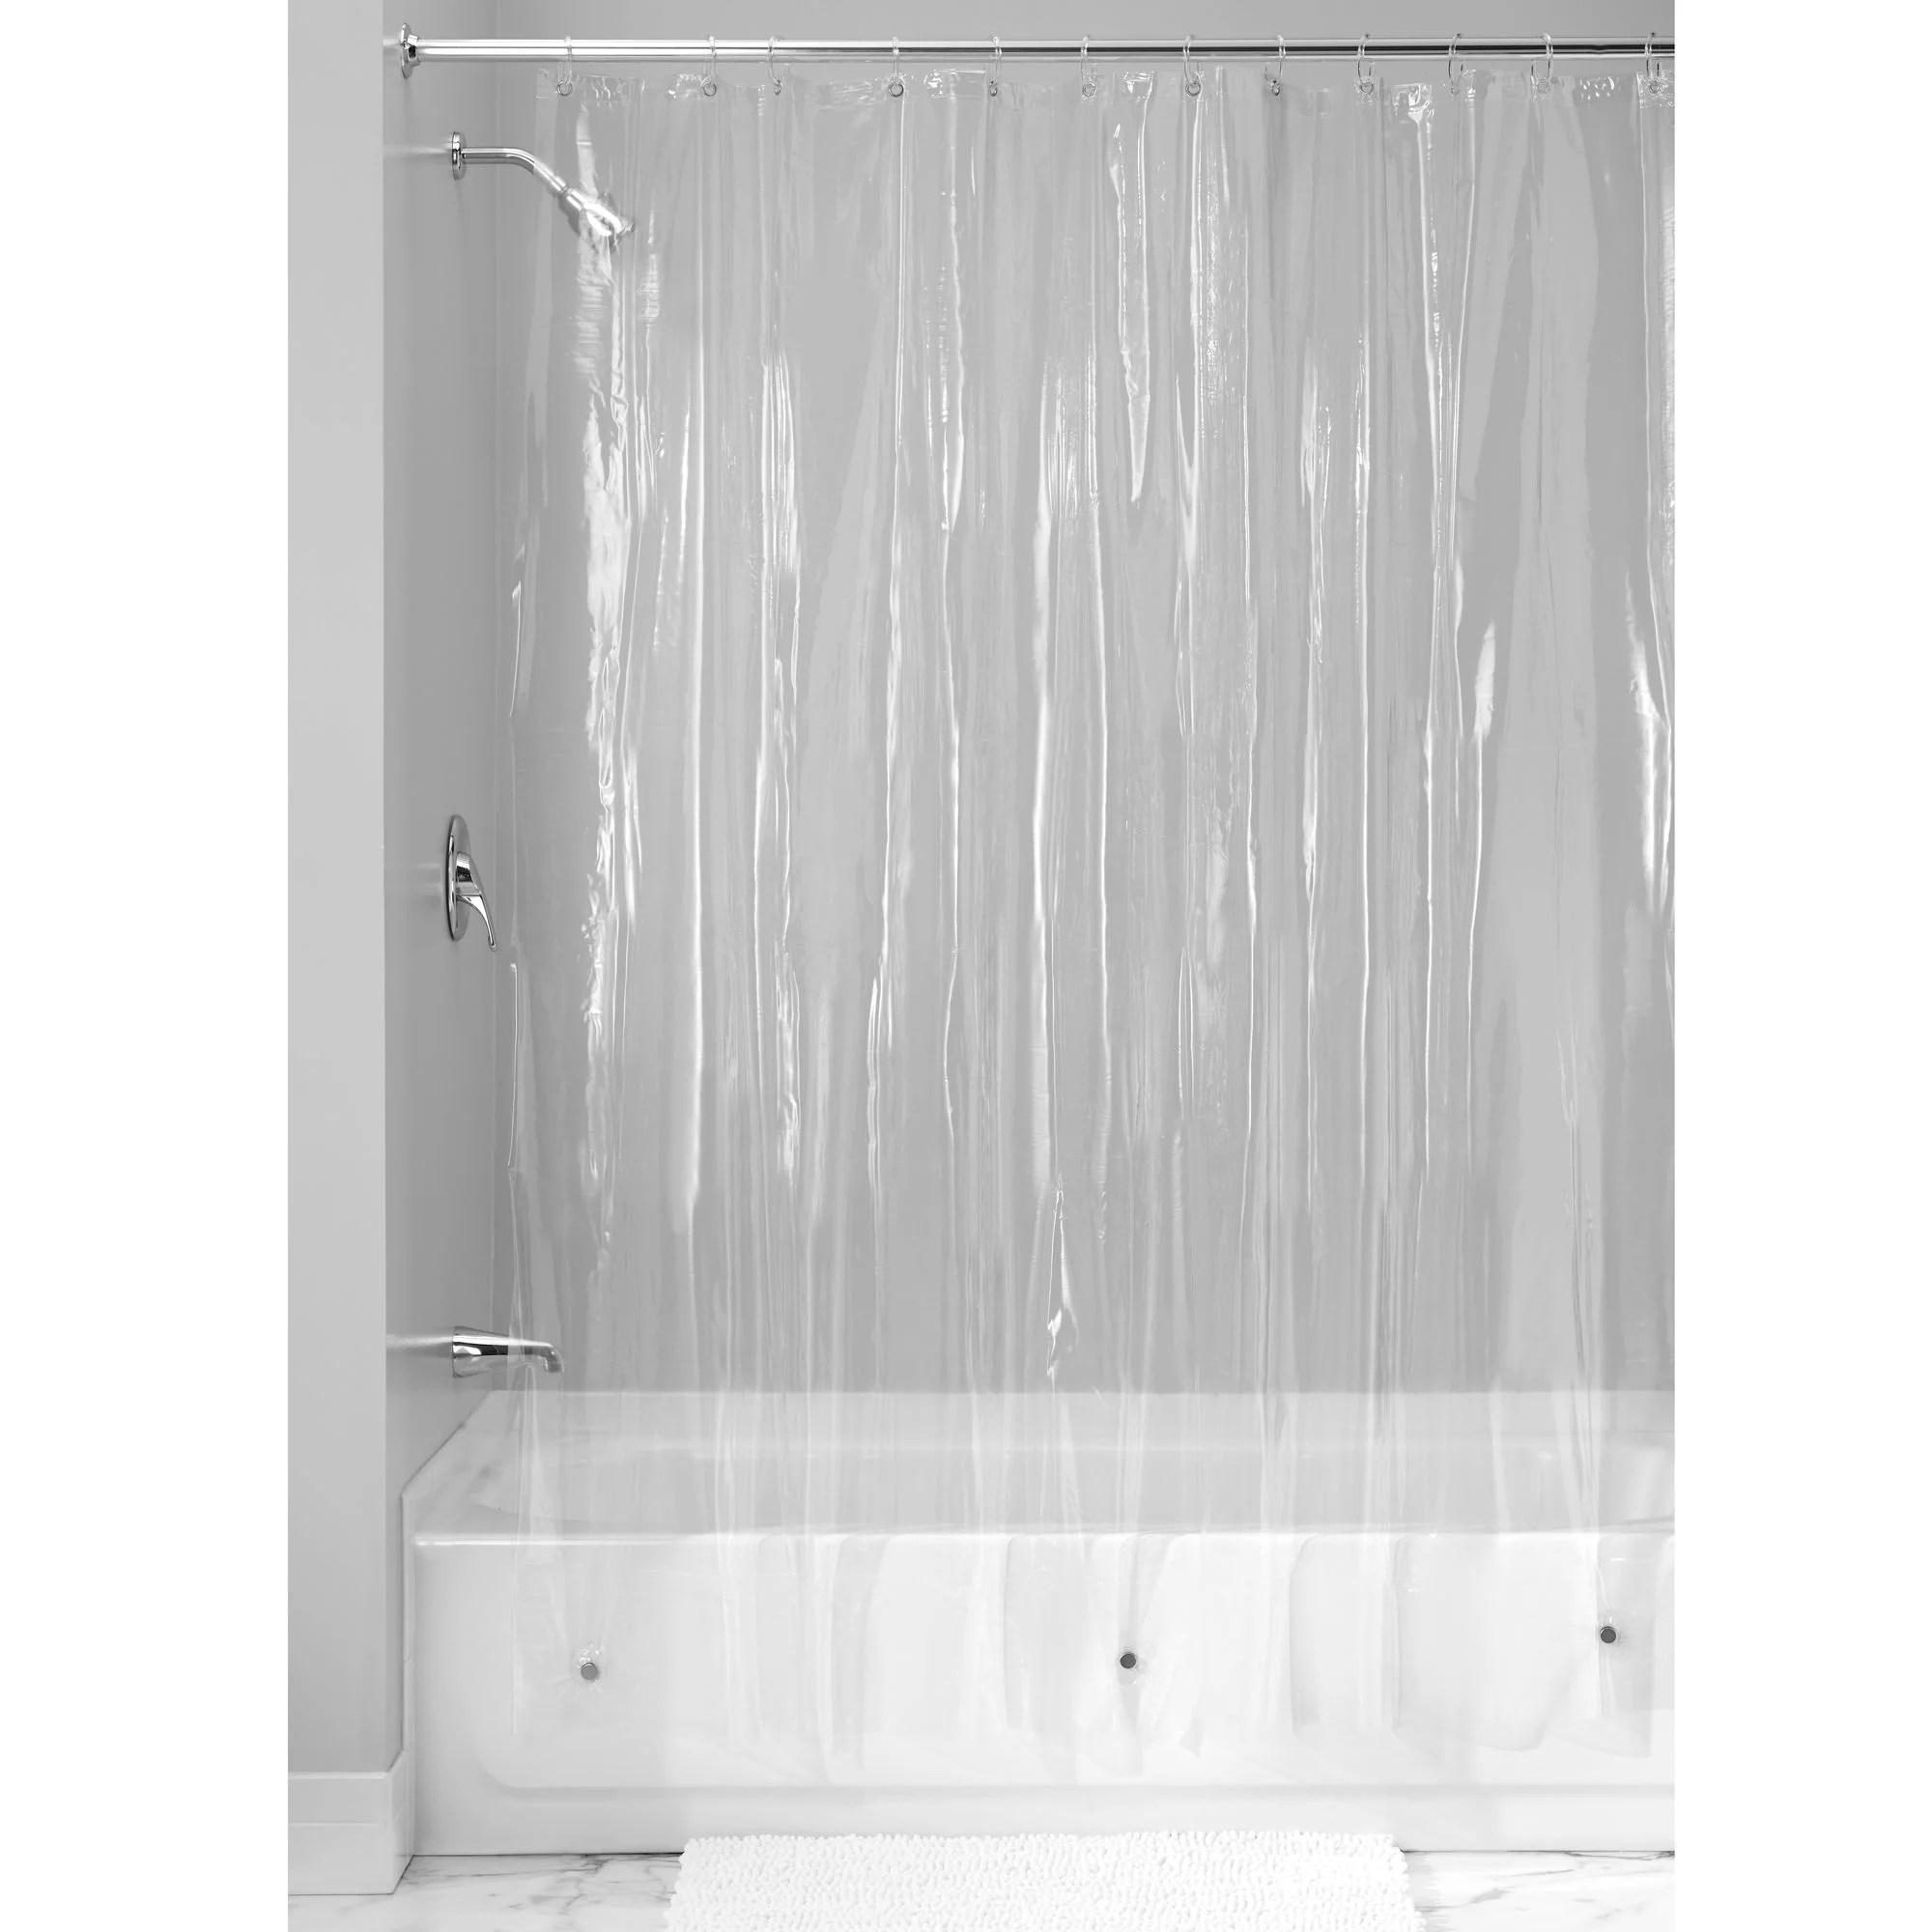 interdesign vinyl shower curtain liner standard 72 x 72 clear walmart com